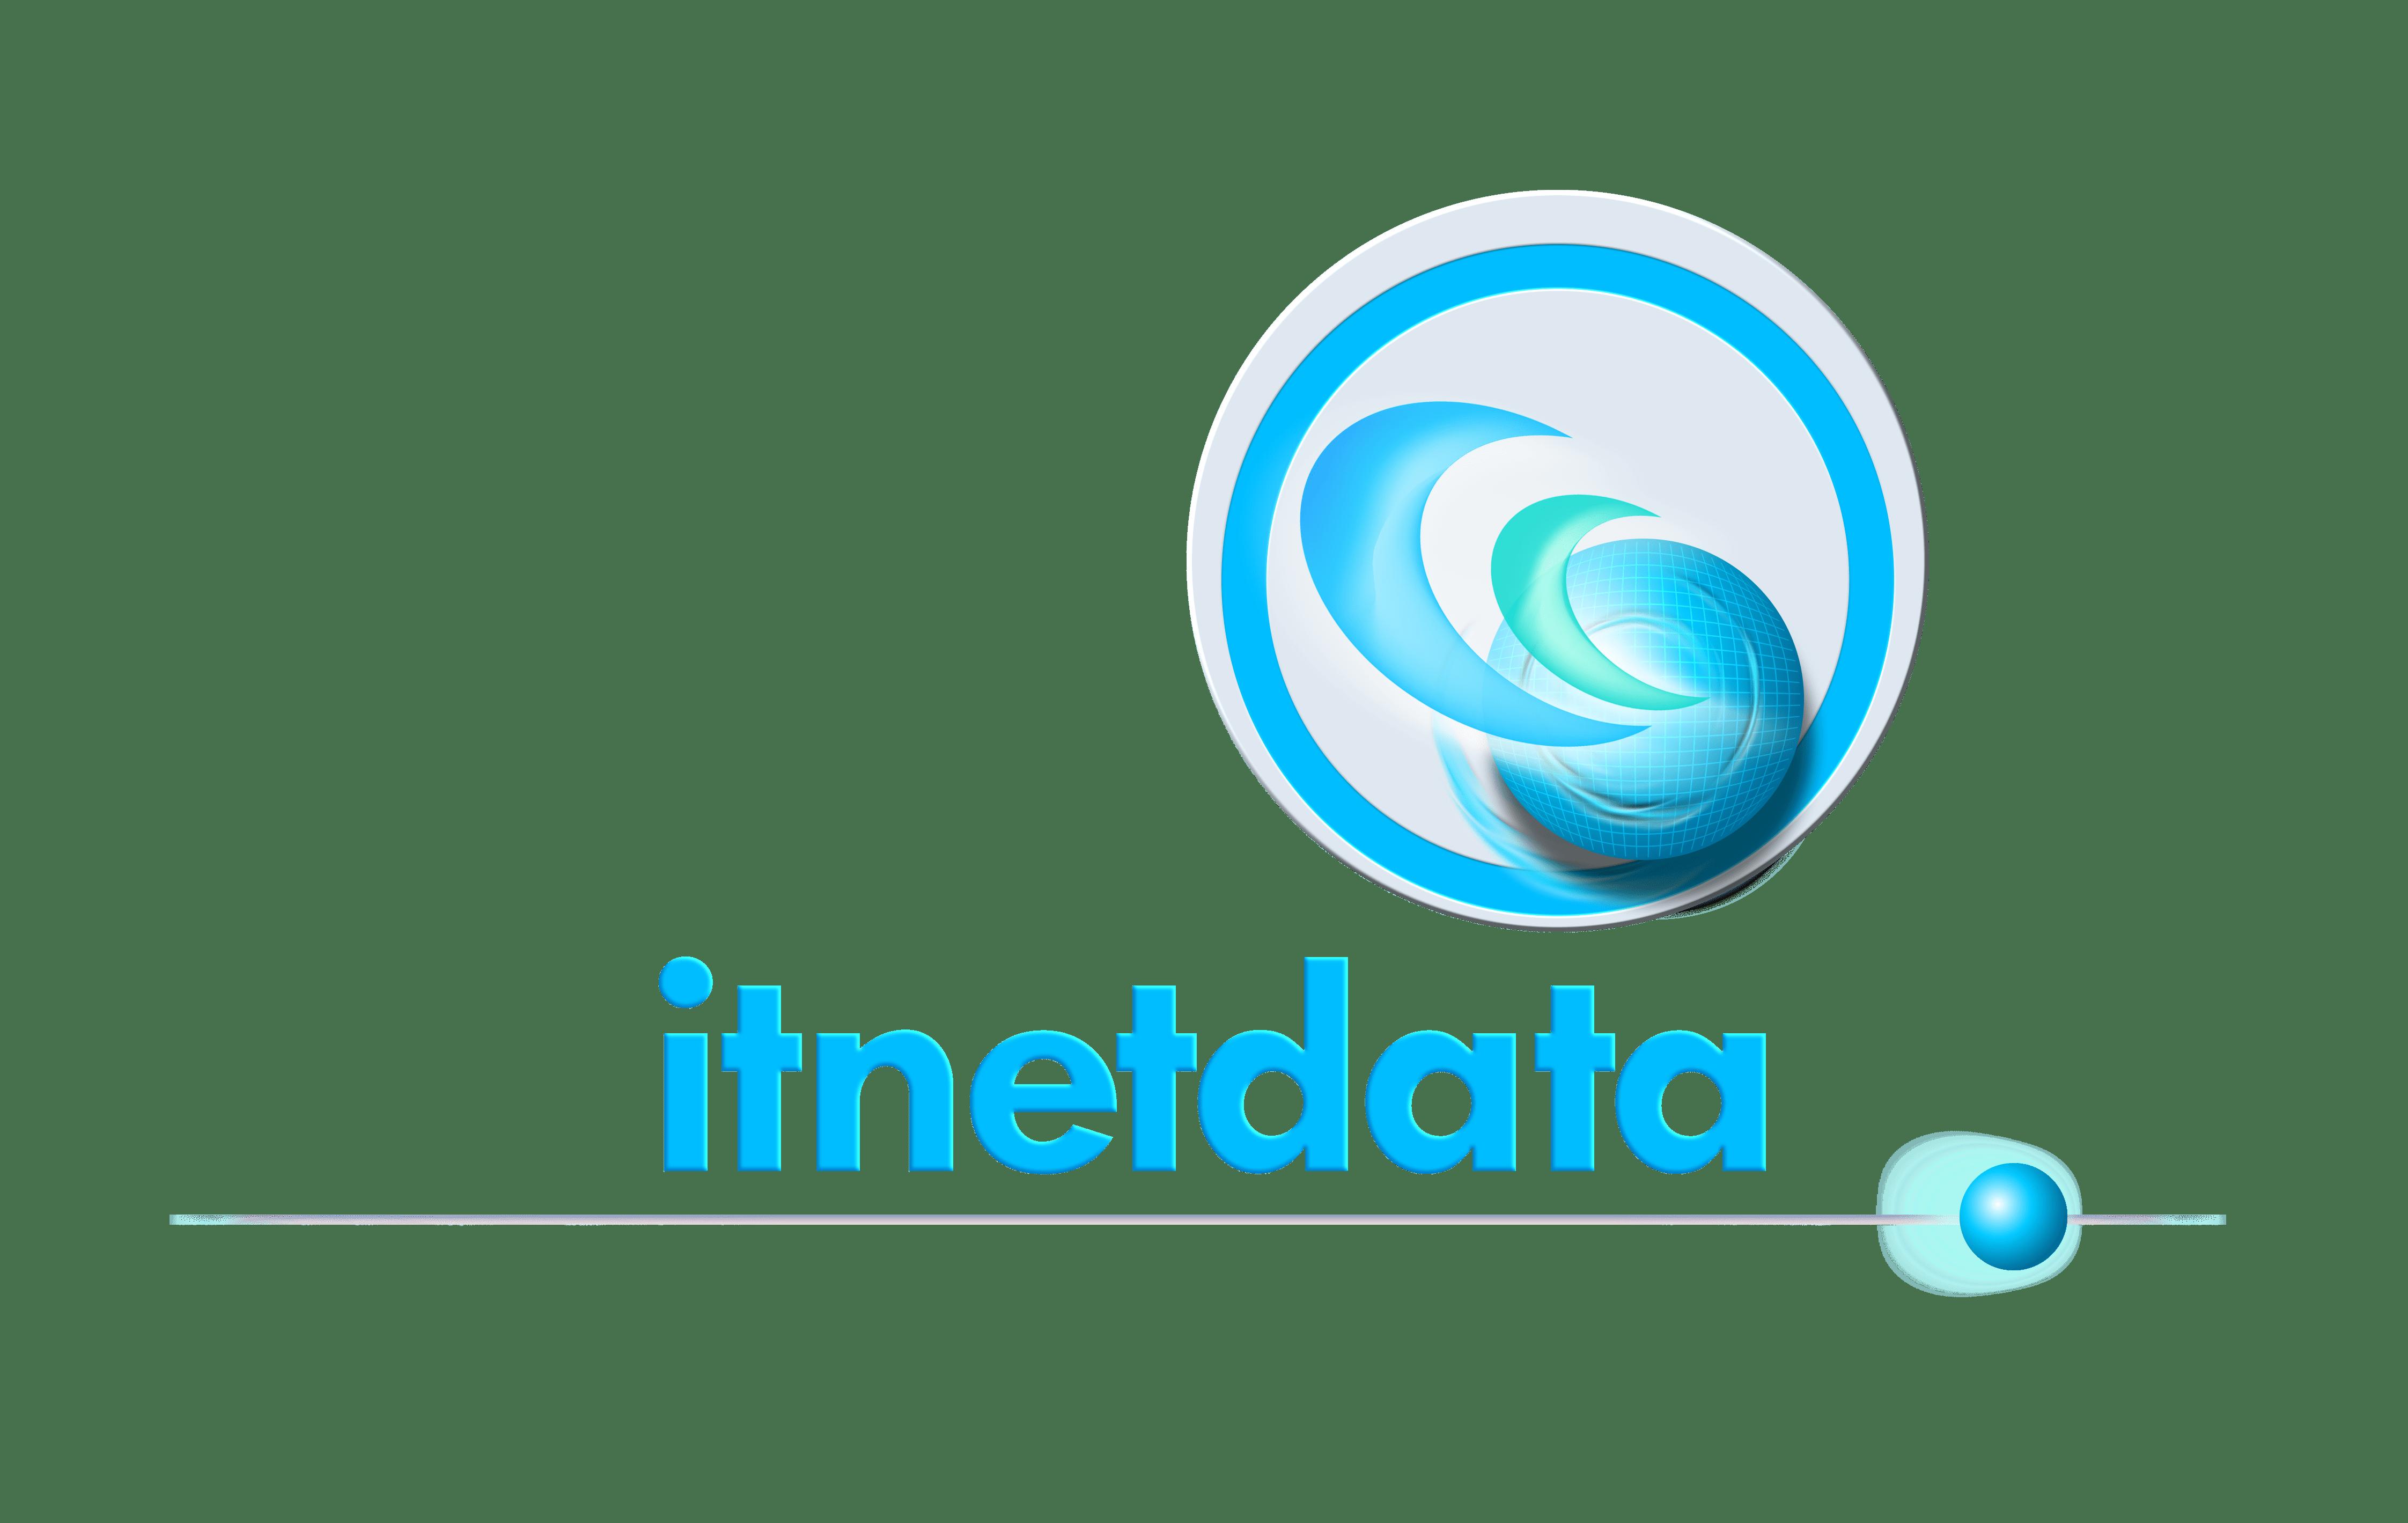 logo itnetdata